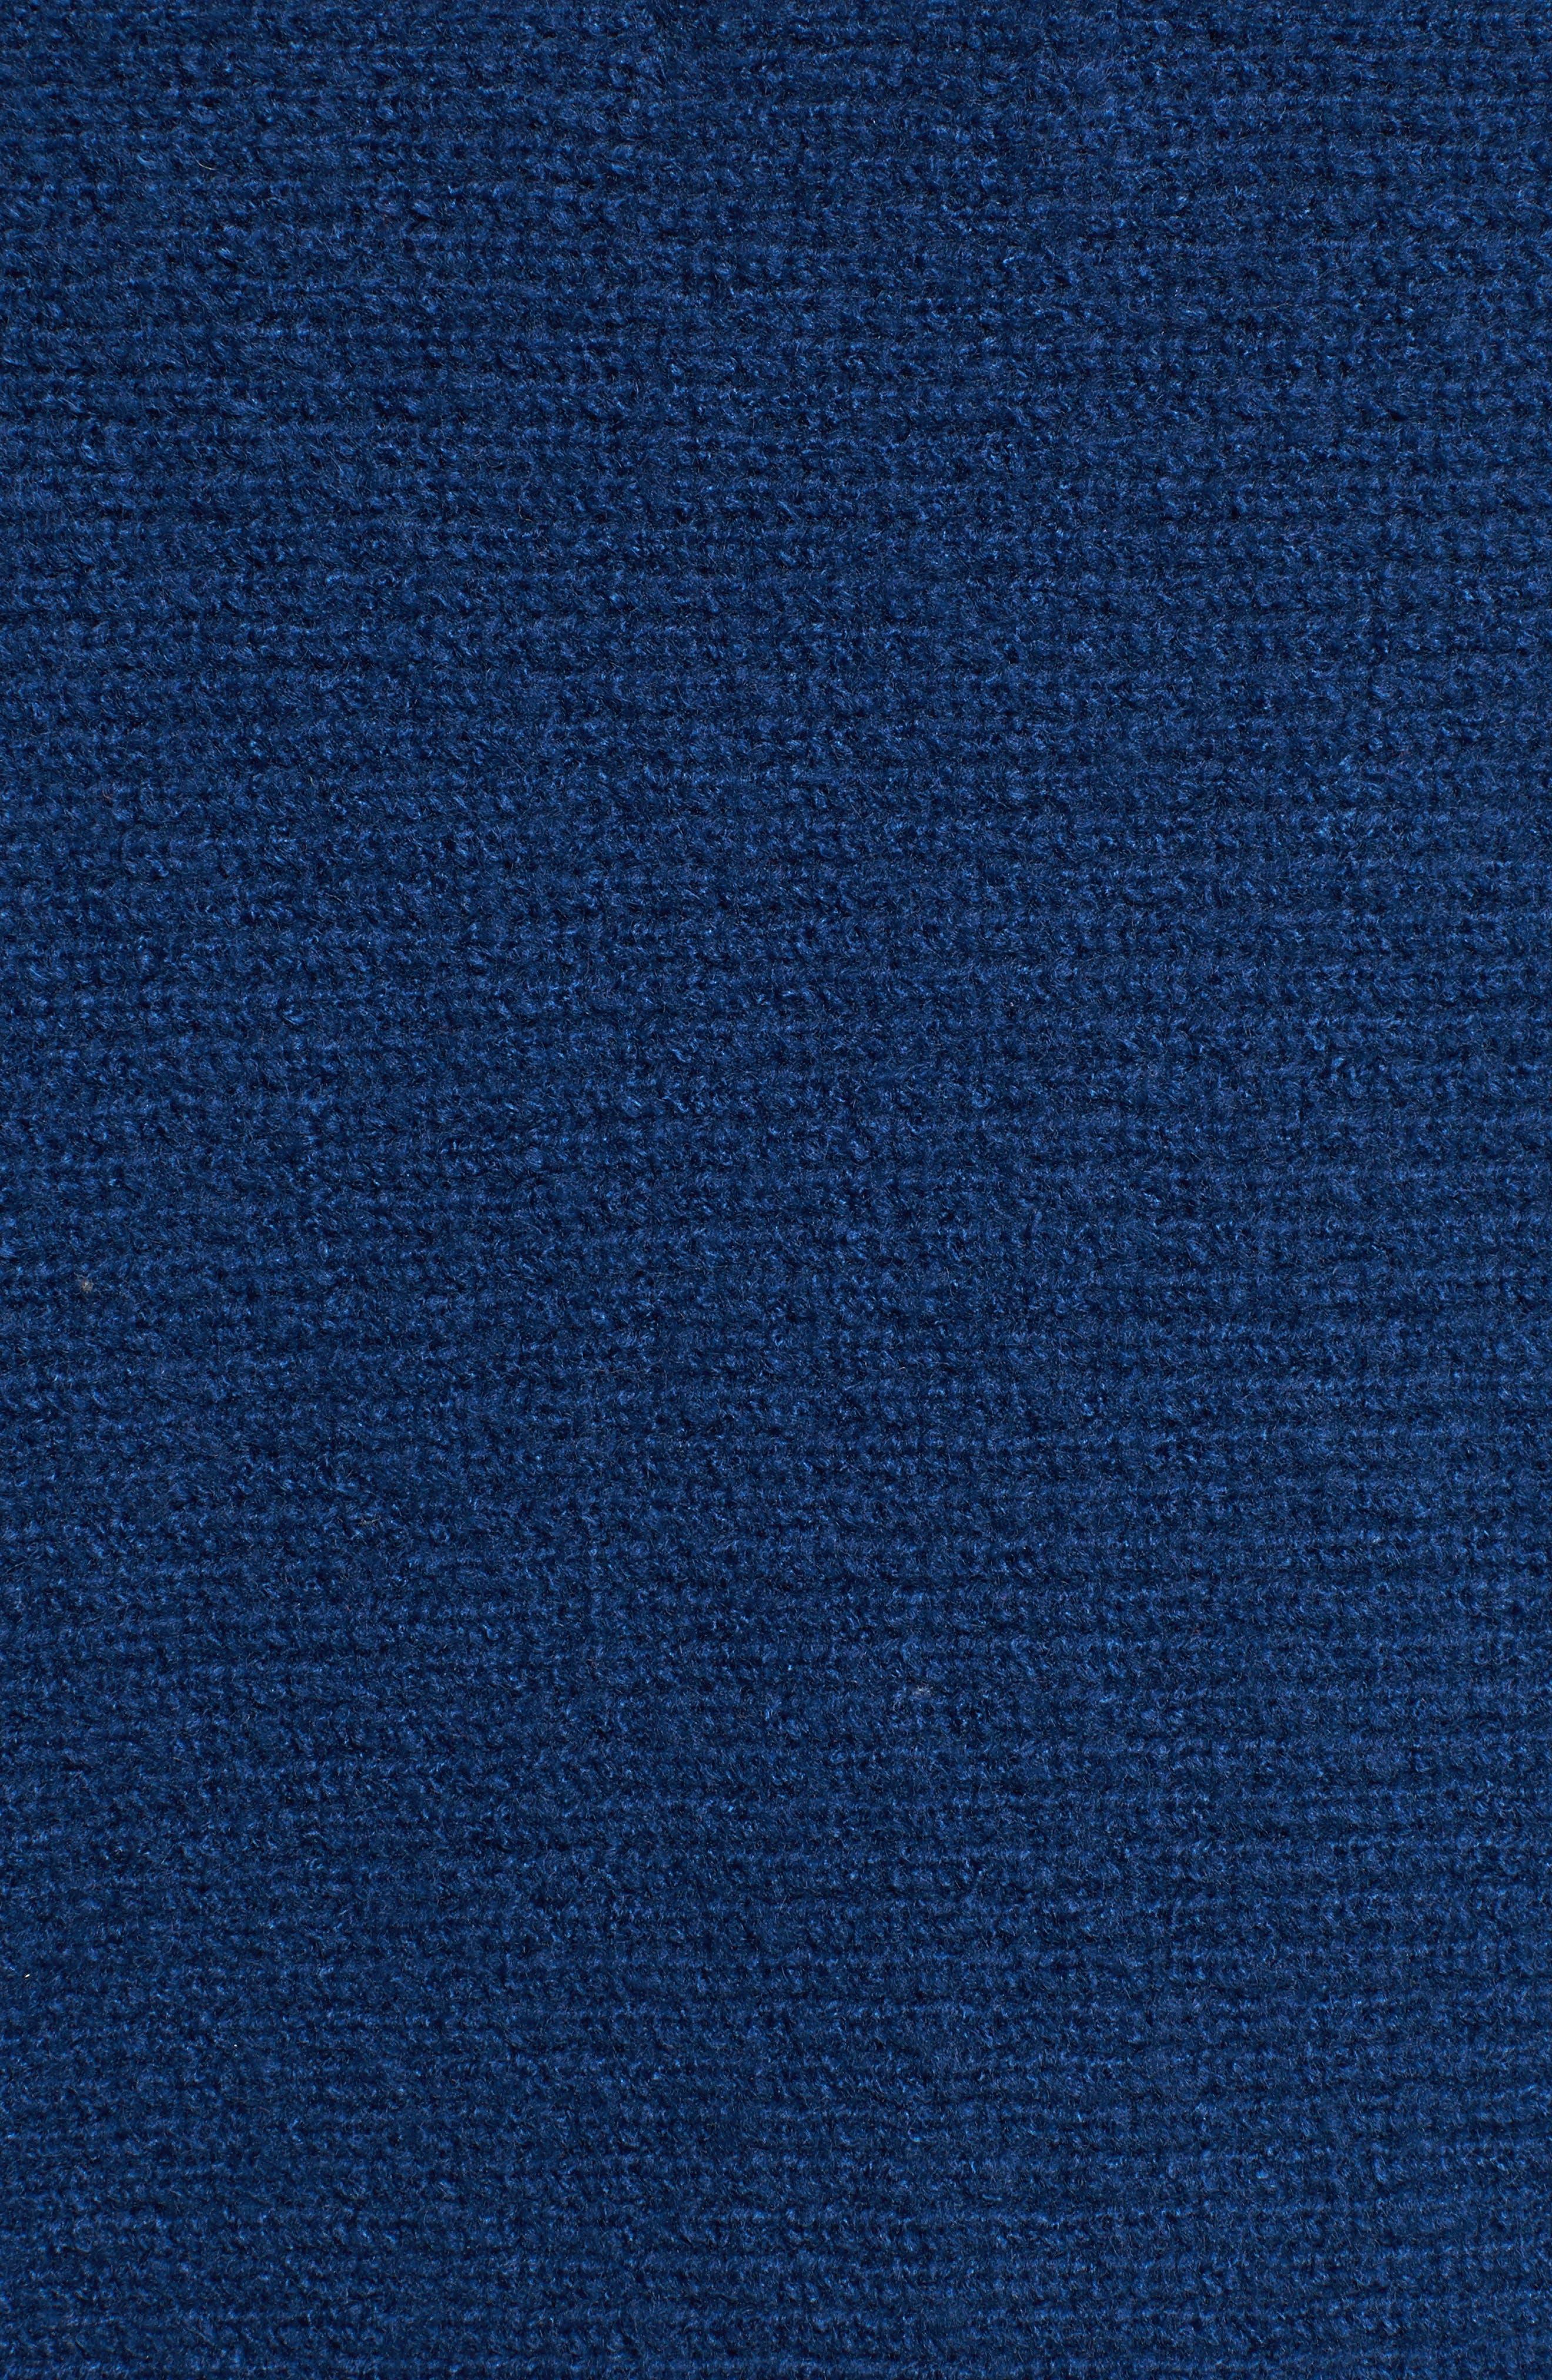 Dolman Sleeve Sweater,                             Alternate thumbnail 5, color,                             Blue Estate